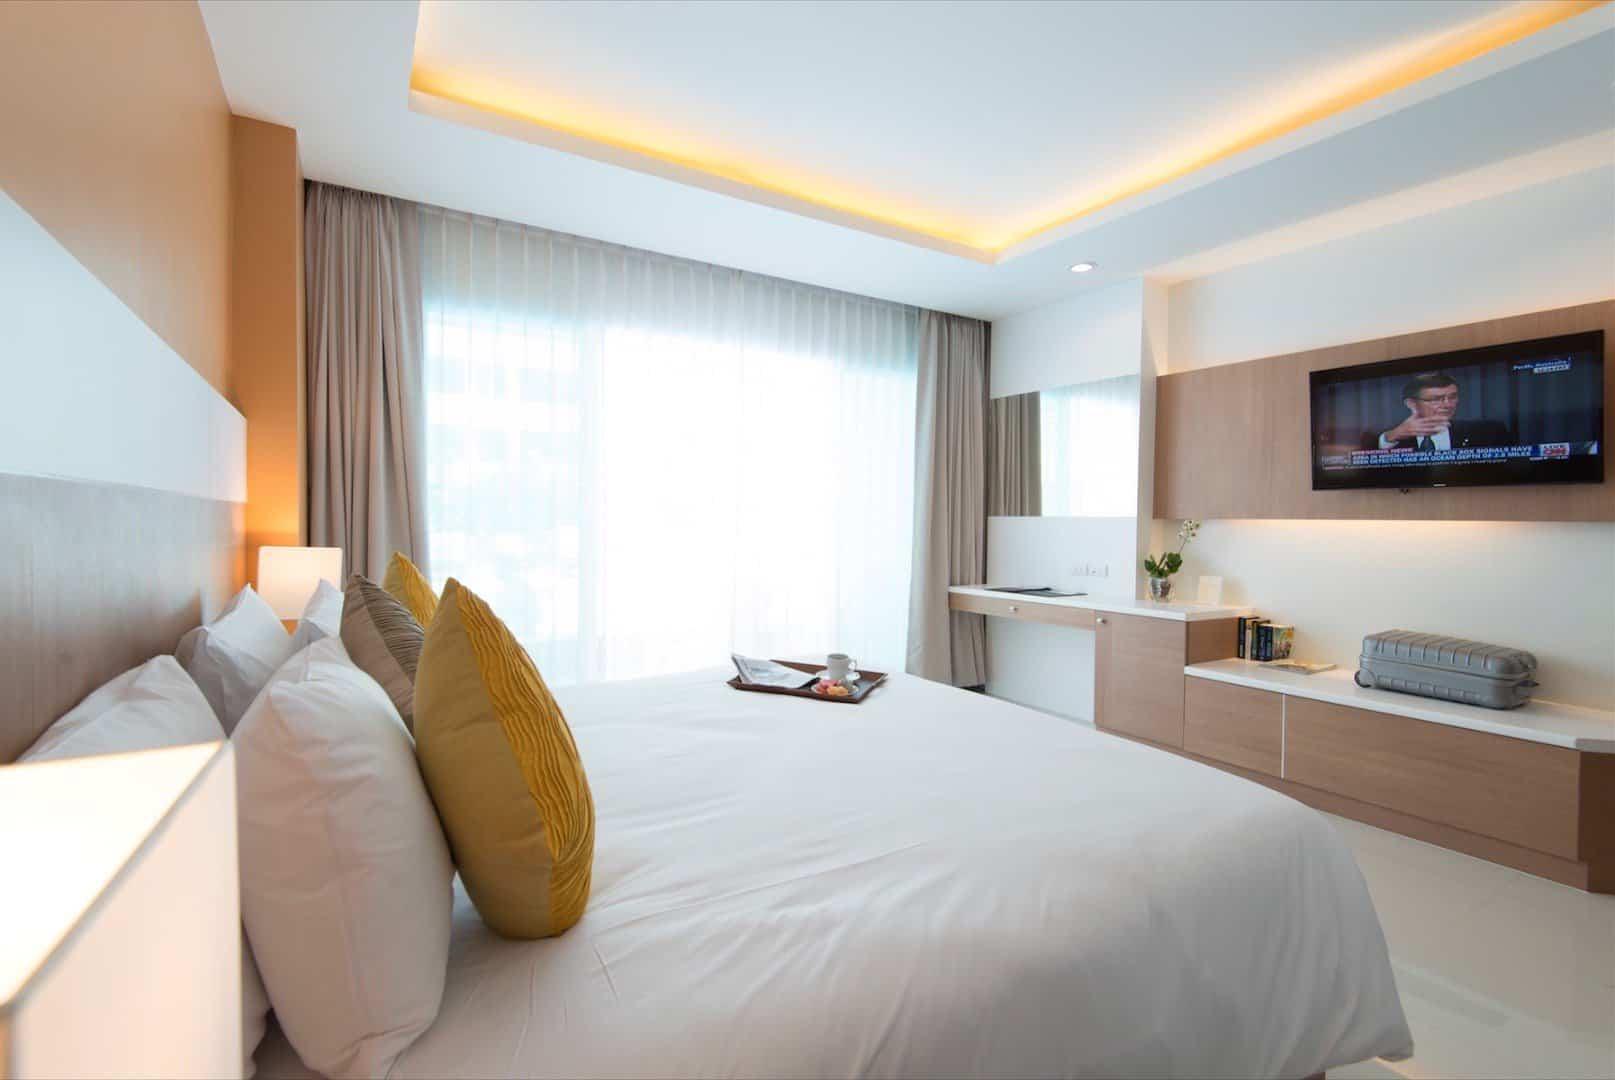 Chanalai hillside resort - Deluxe room